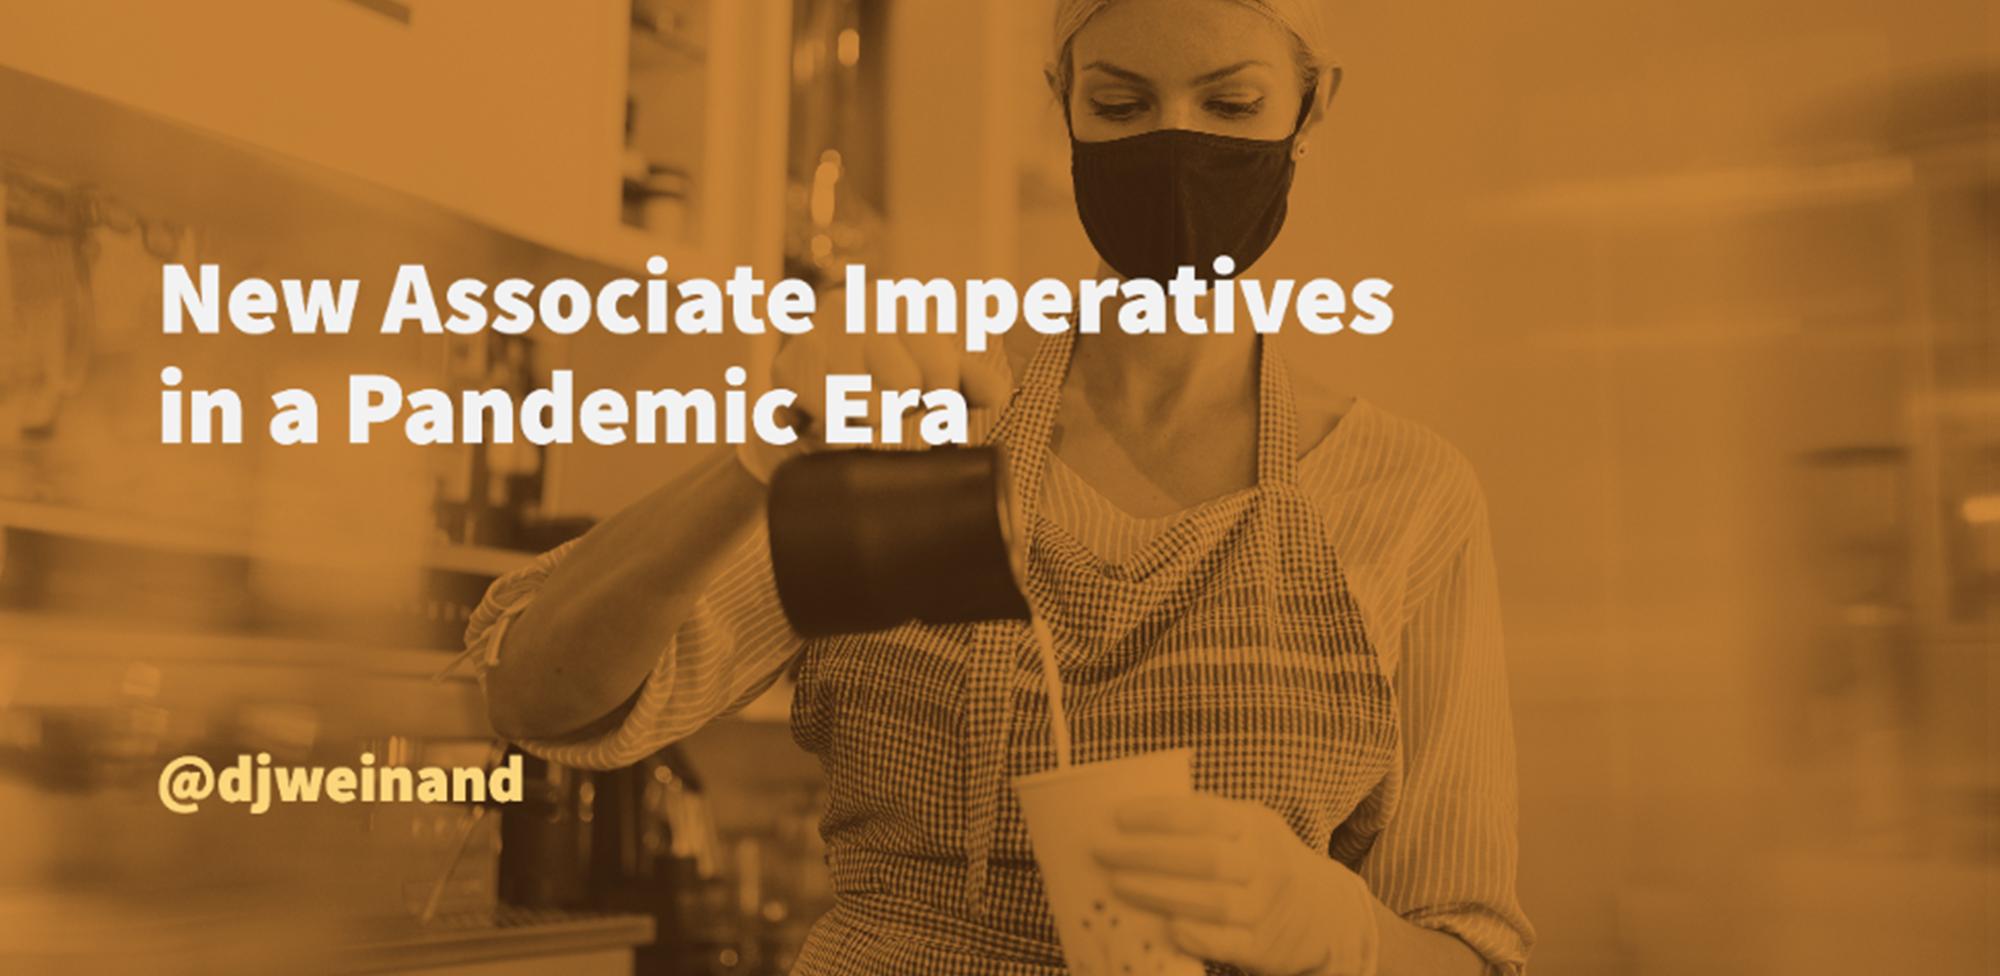 New Associate Imperatives in a Pandemic Era